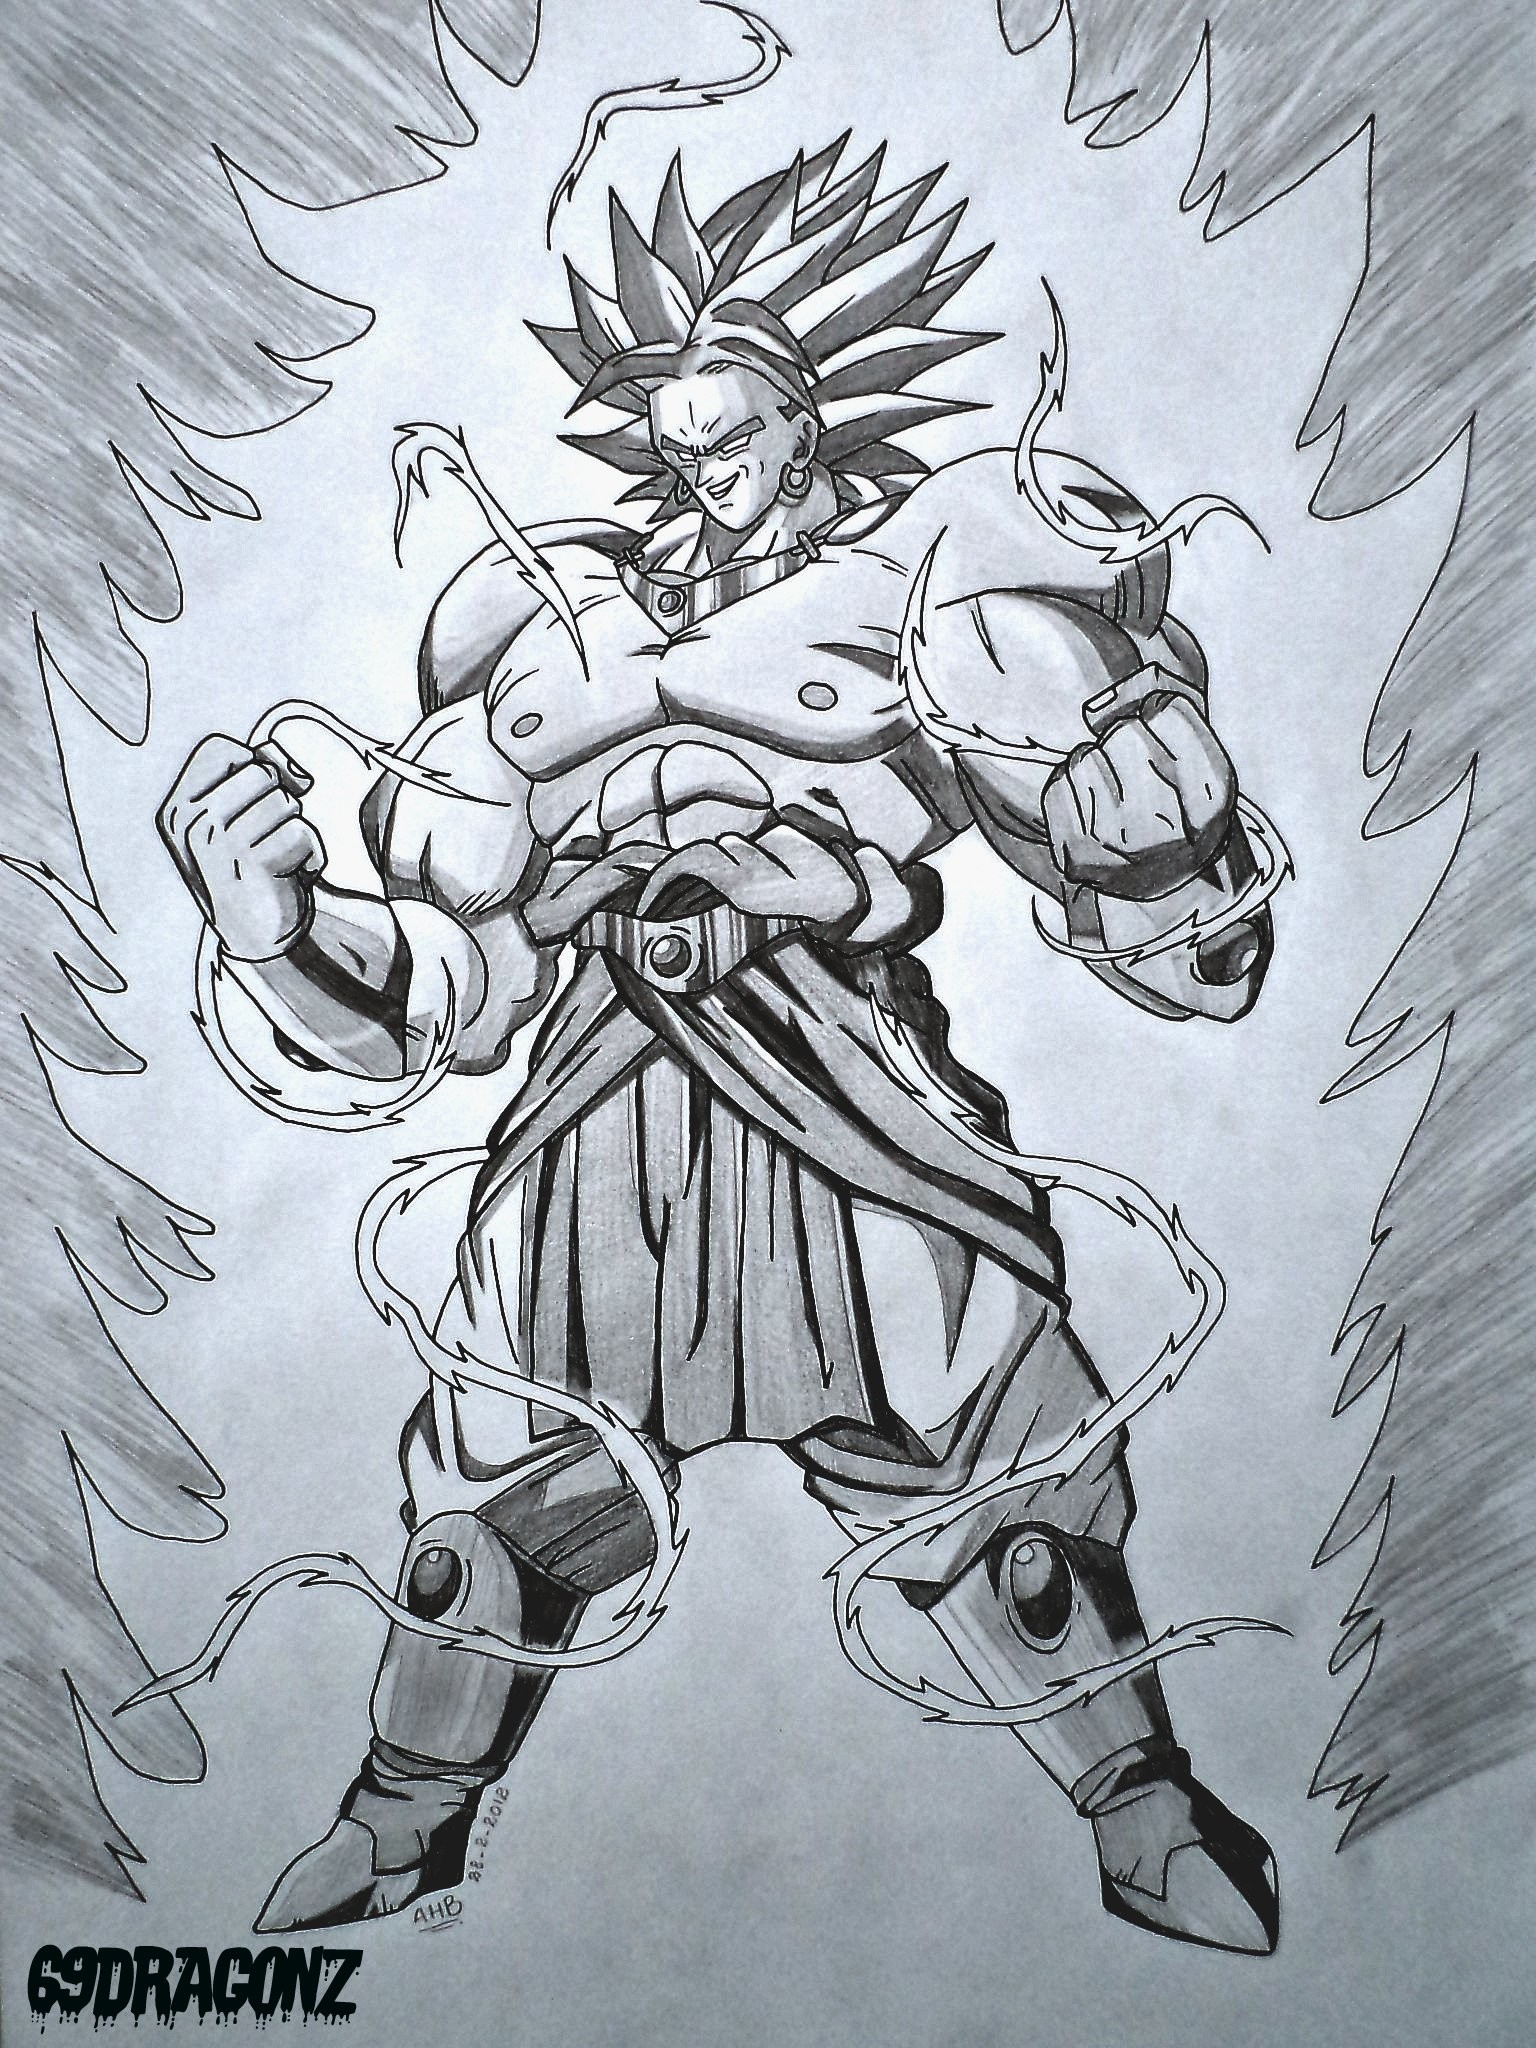 … Broly The Legendary Super Saiyan by 69dragonz